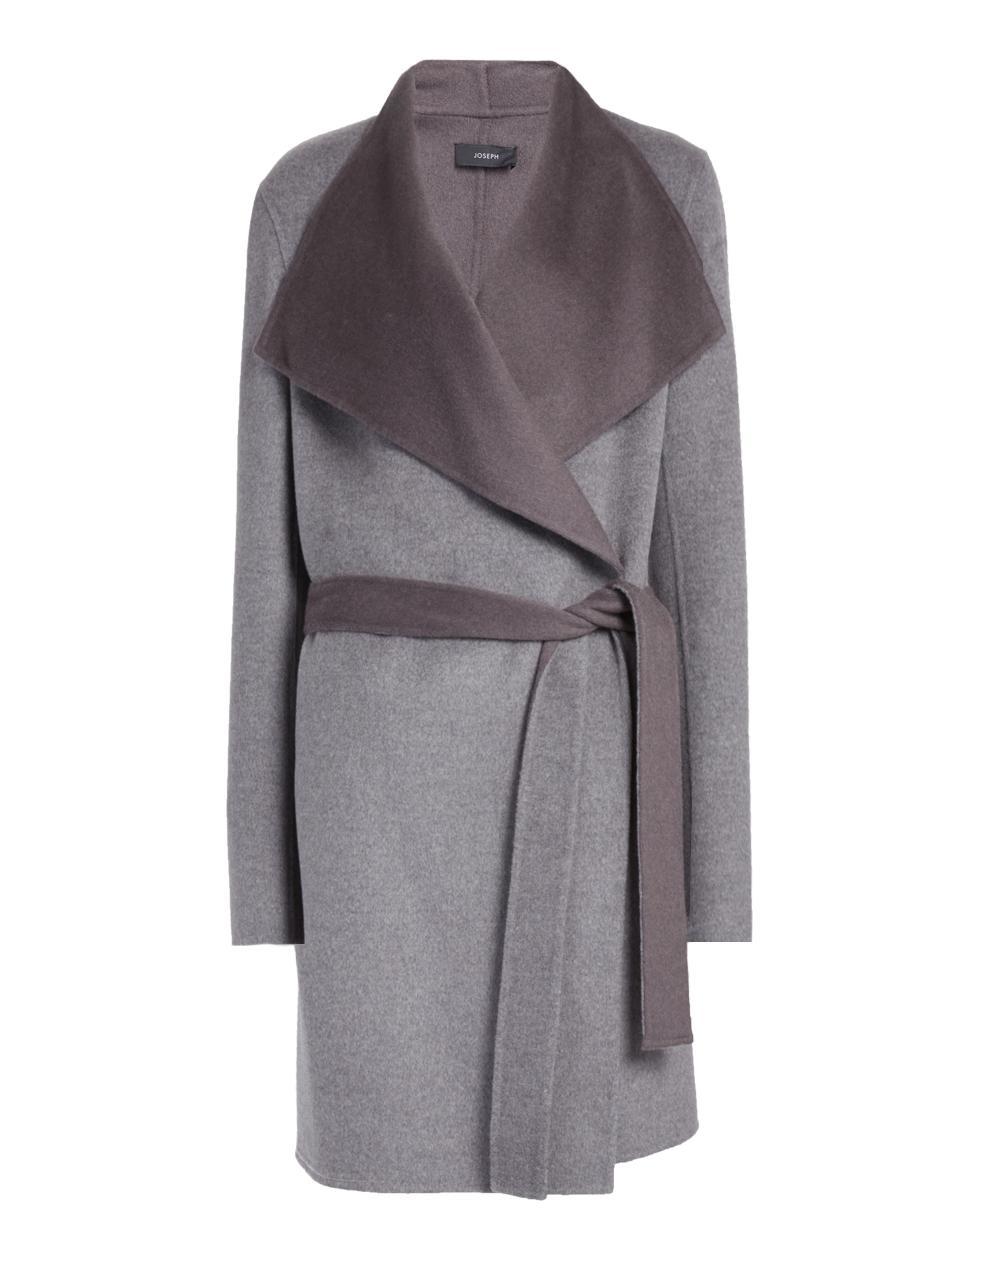 joseph-smoke-combo-double-cashmere-lisa-long-coat-gray-product-0-119625139-normal.jpg